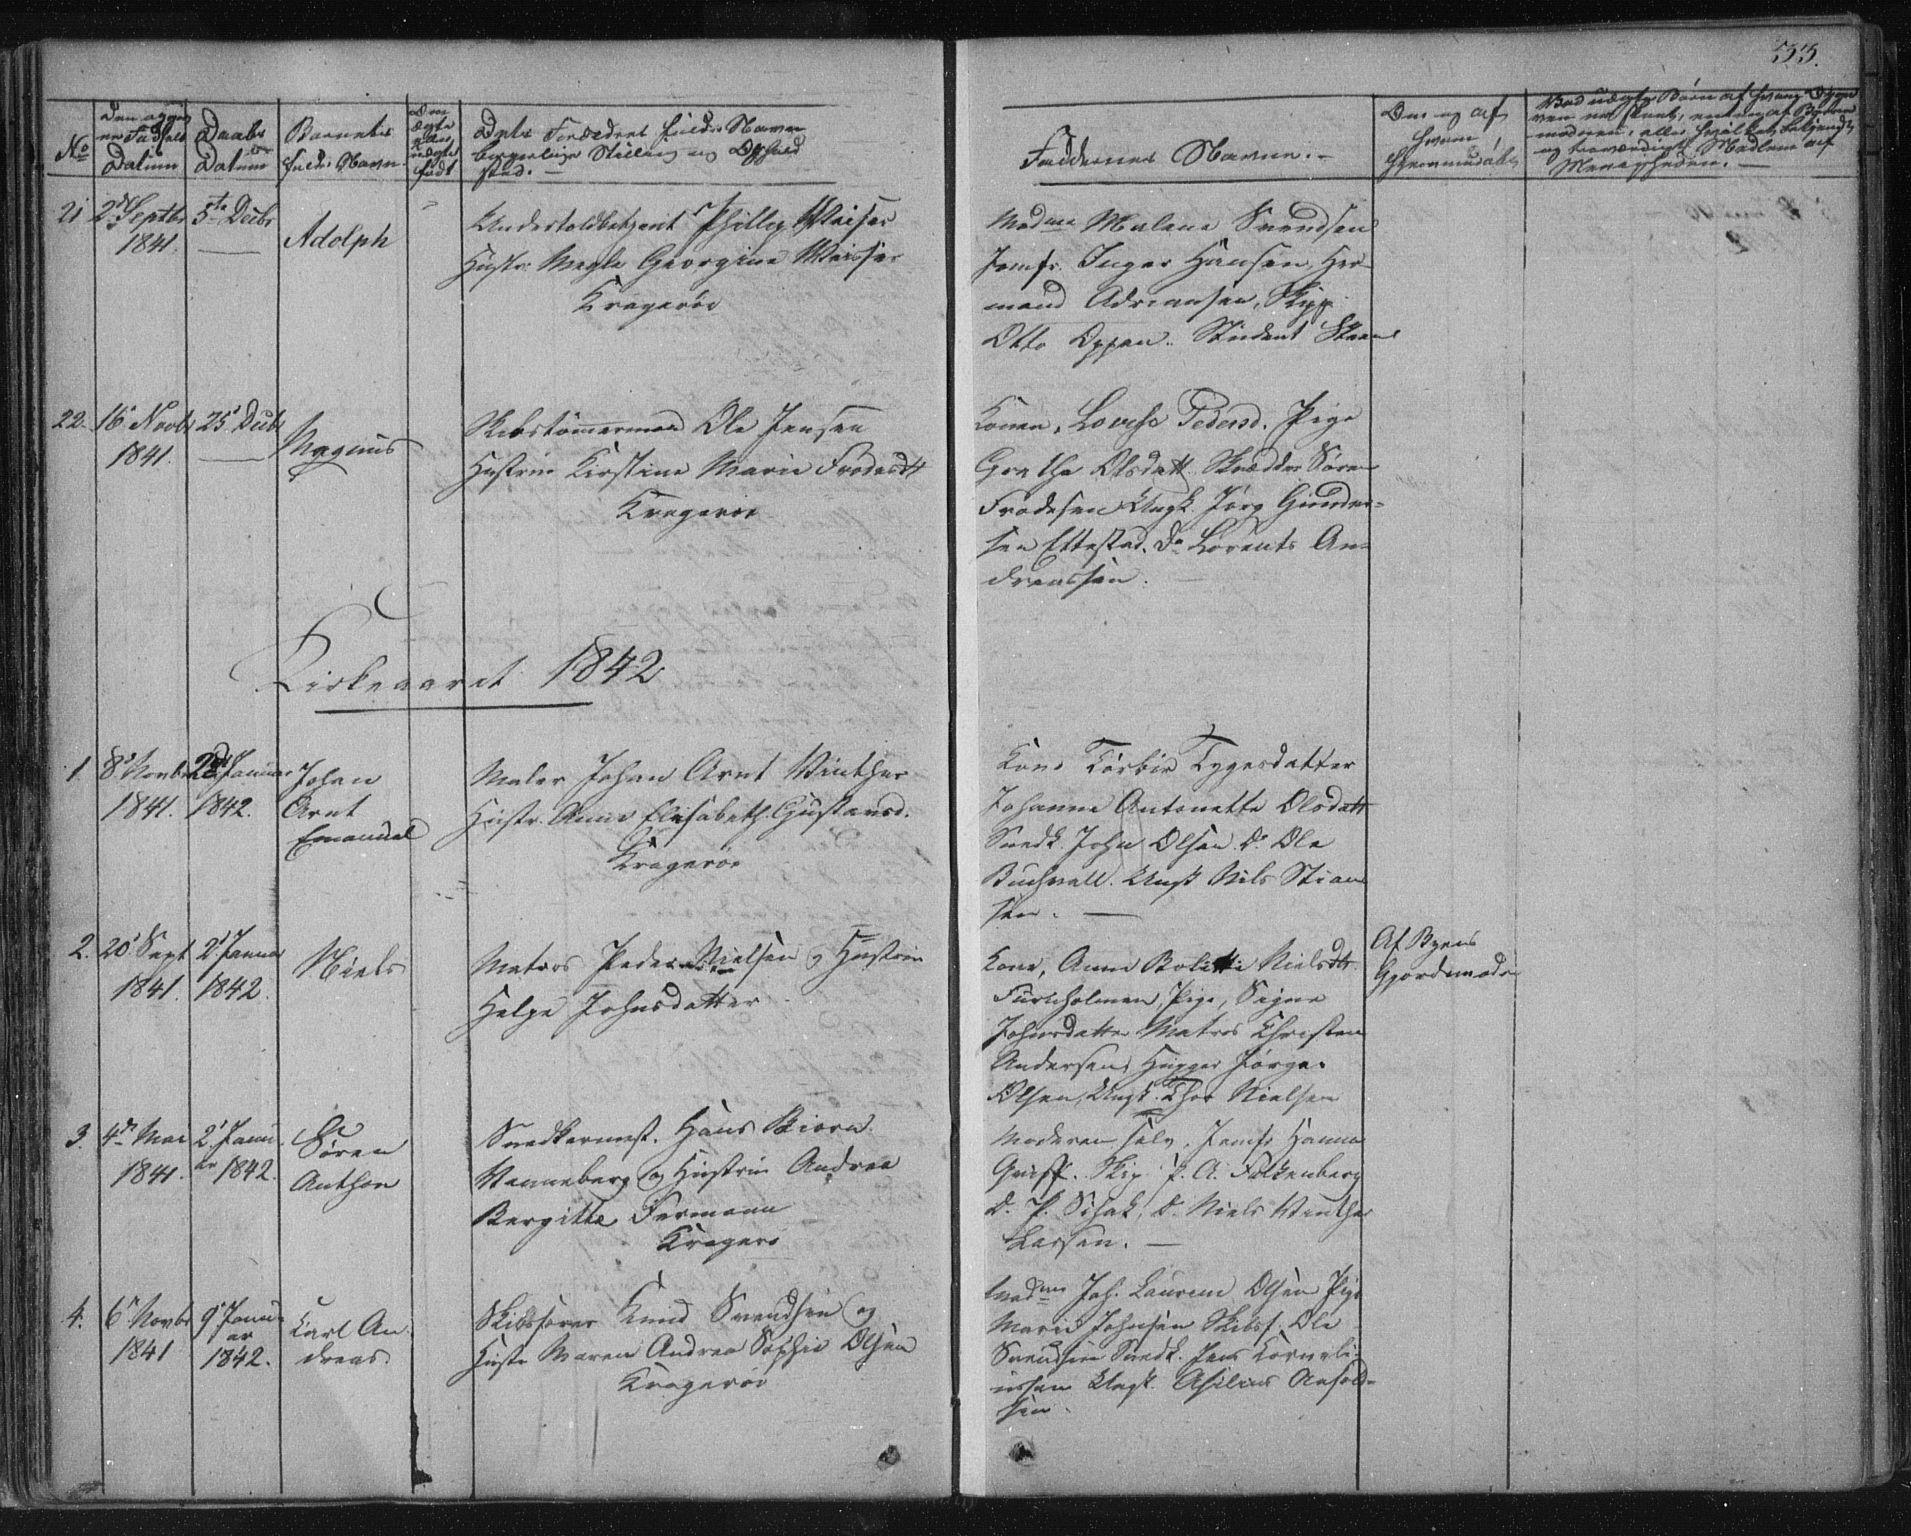 SAKO, Kragerø kirkebøker, F/Fa/L0005: Ministerialbok nr. 5, 1832-1847, s. 33